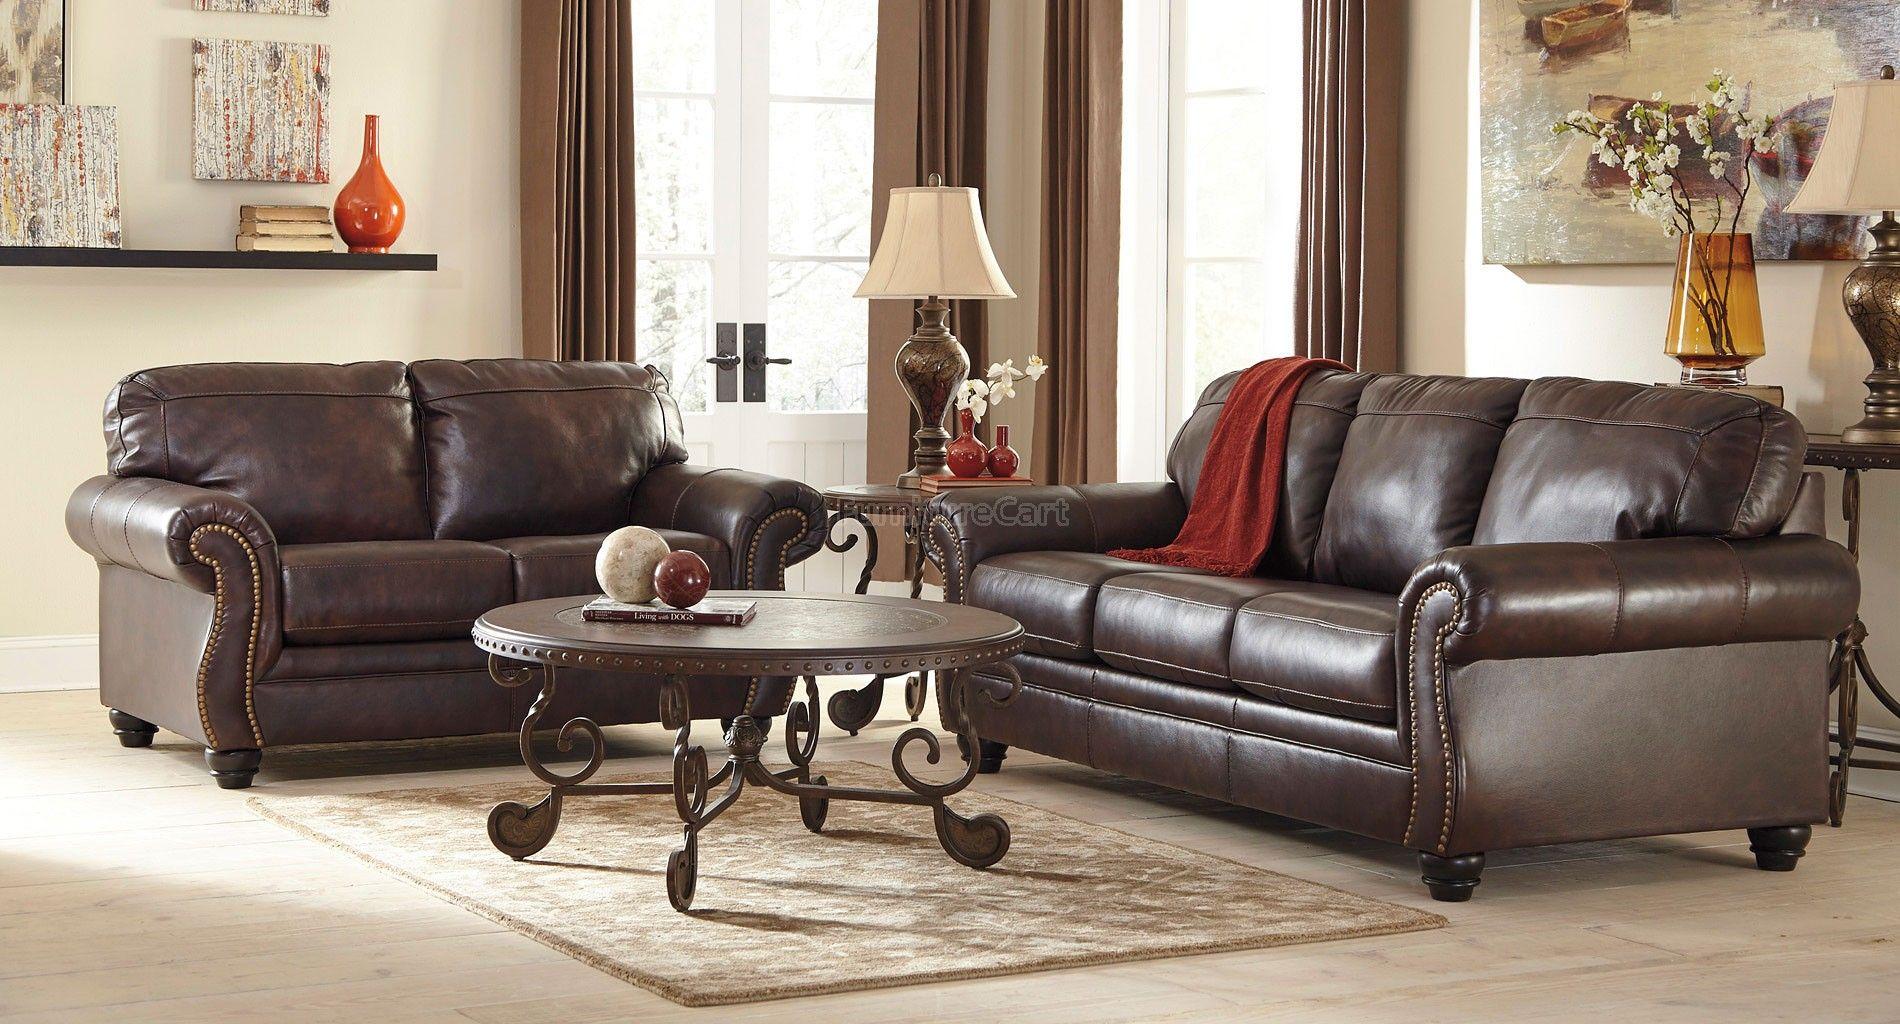 Bristan Walnut Living Room Set Signature Design Luxury Sofa Design Living Room Leather Walnut Living Room